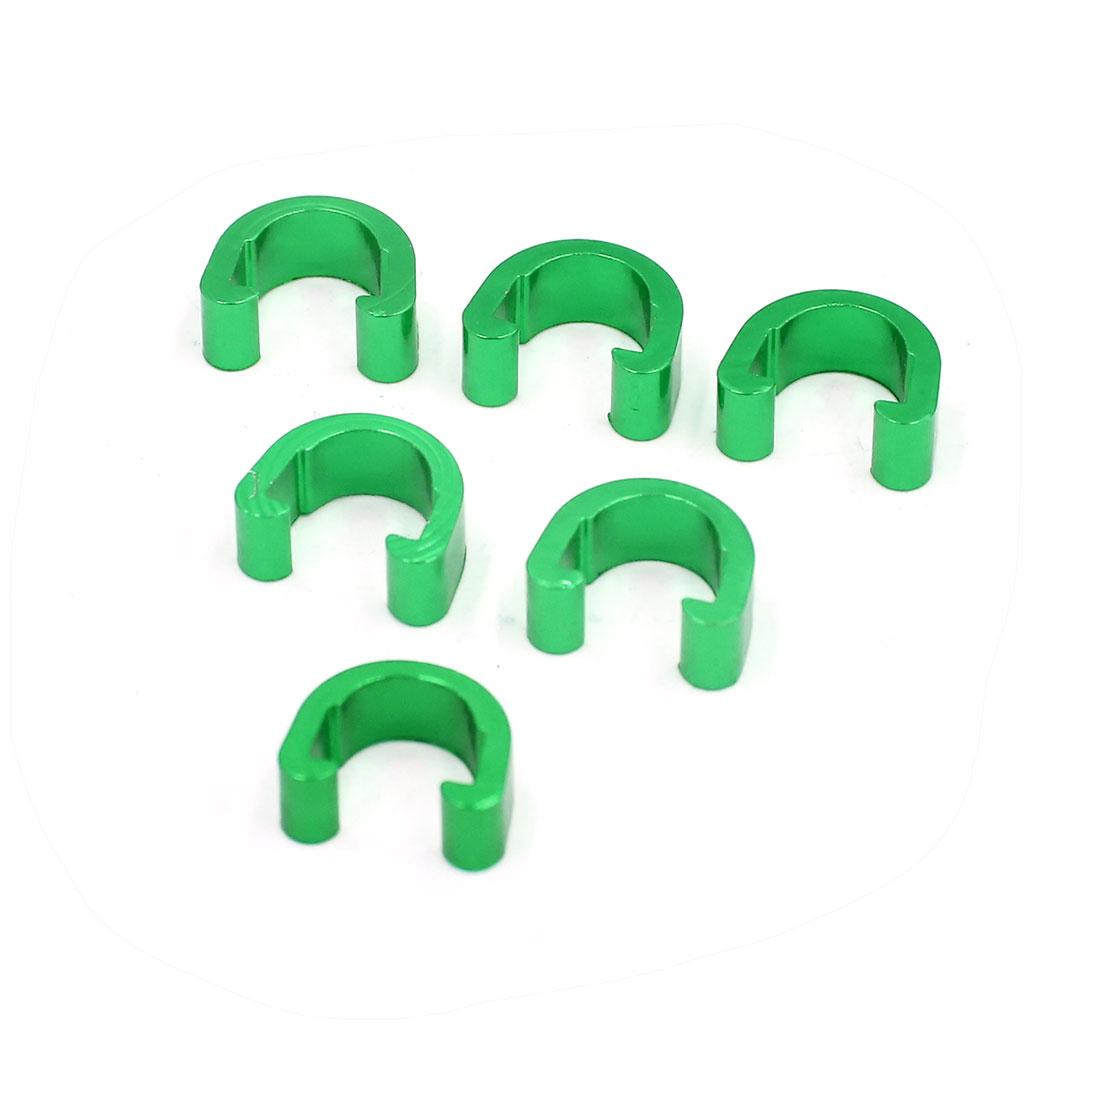 6pcs Green Aluminium Alloy MTB Bike C-Clip Brake Cable Housing Hose Guide Clamp